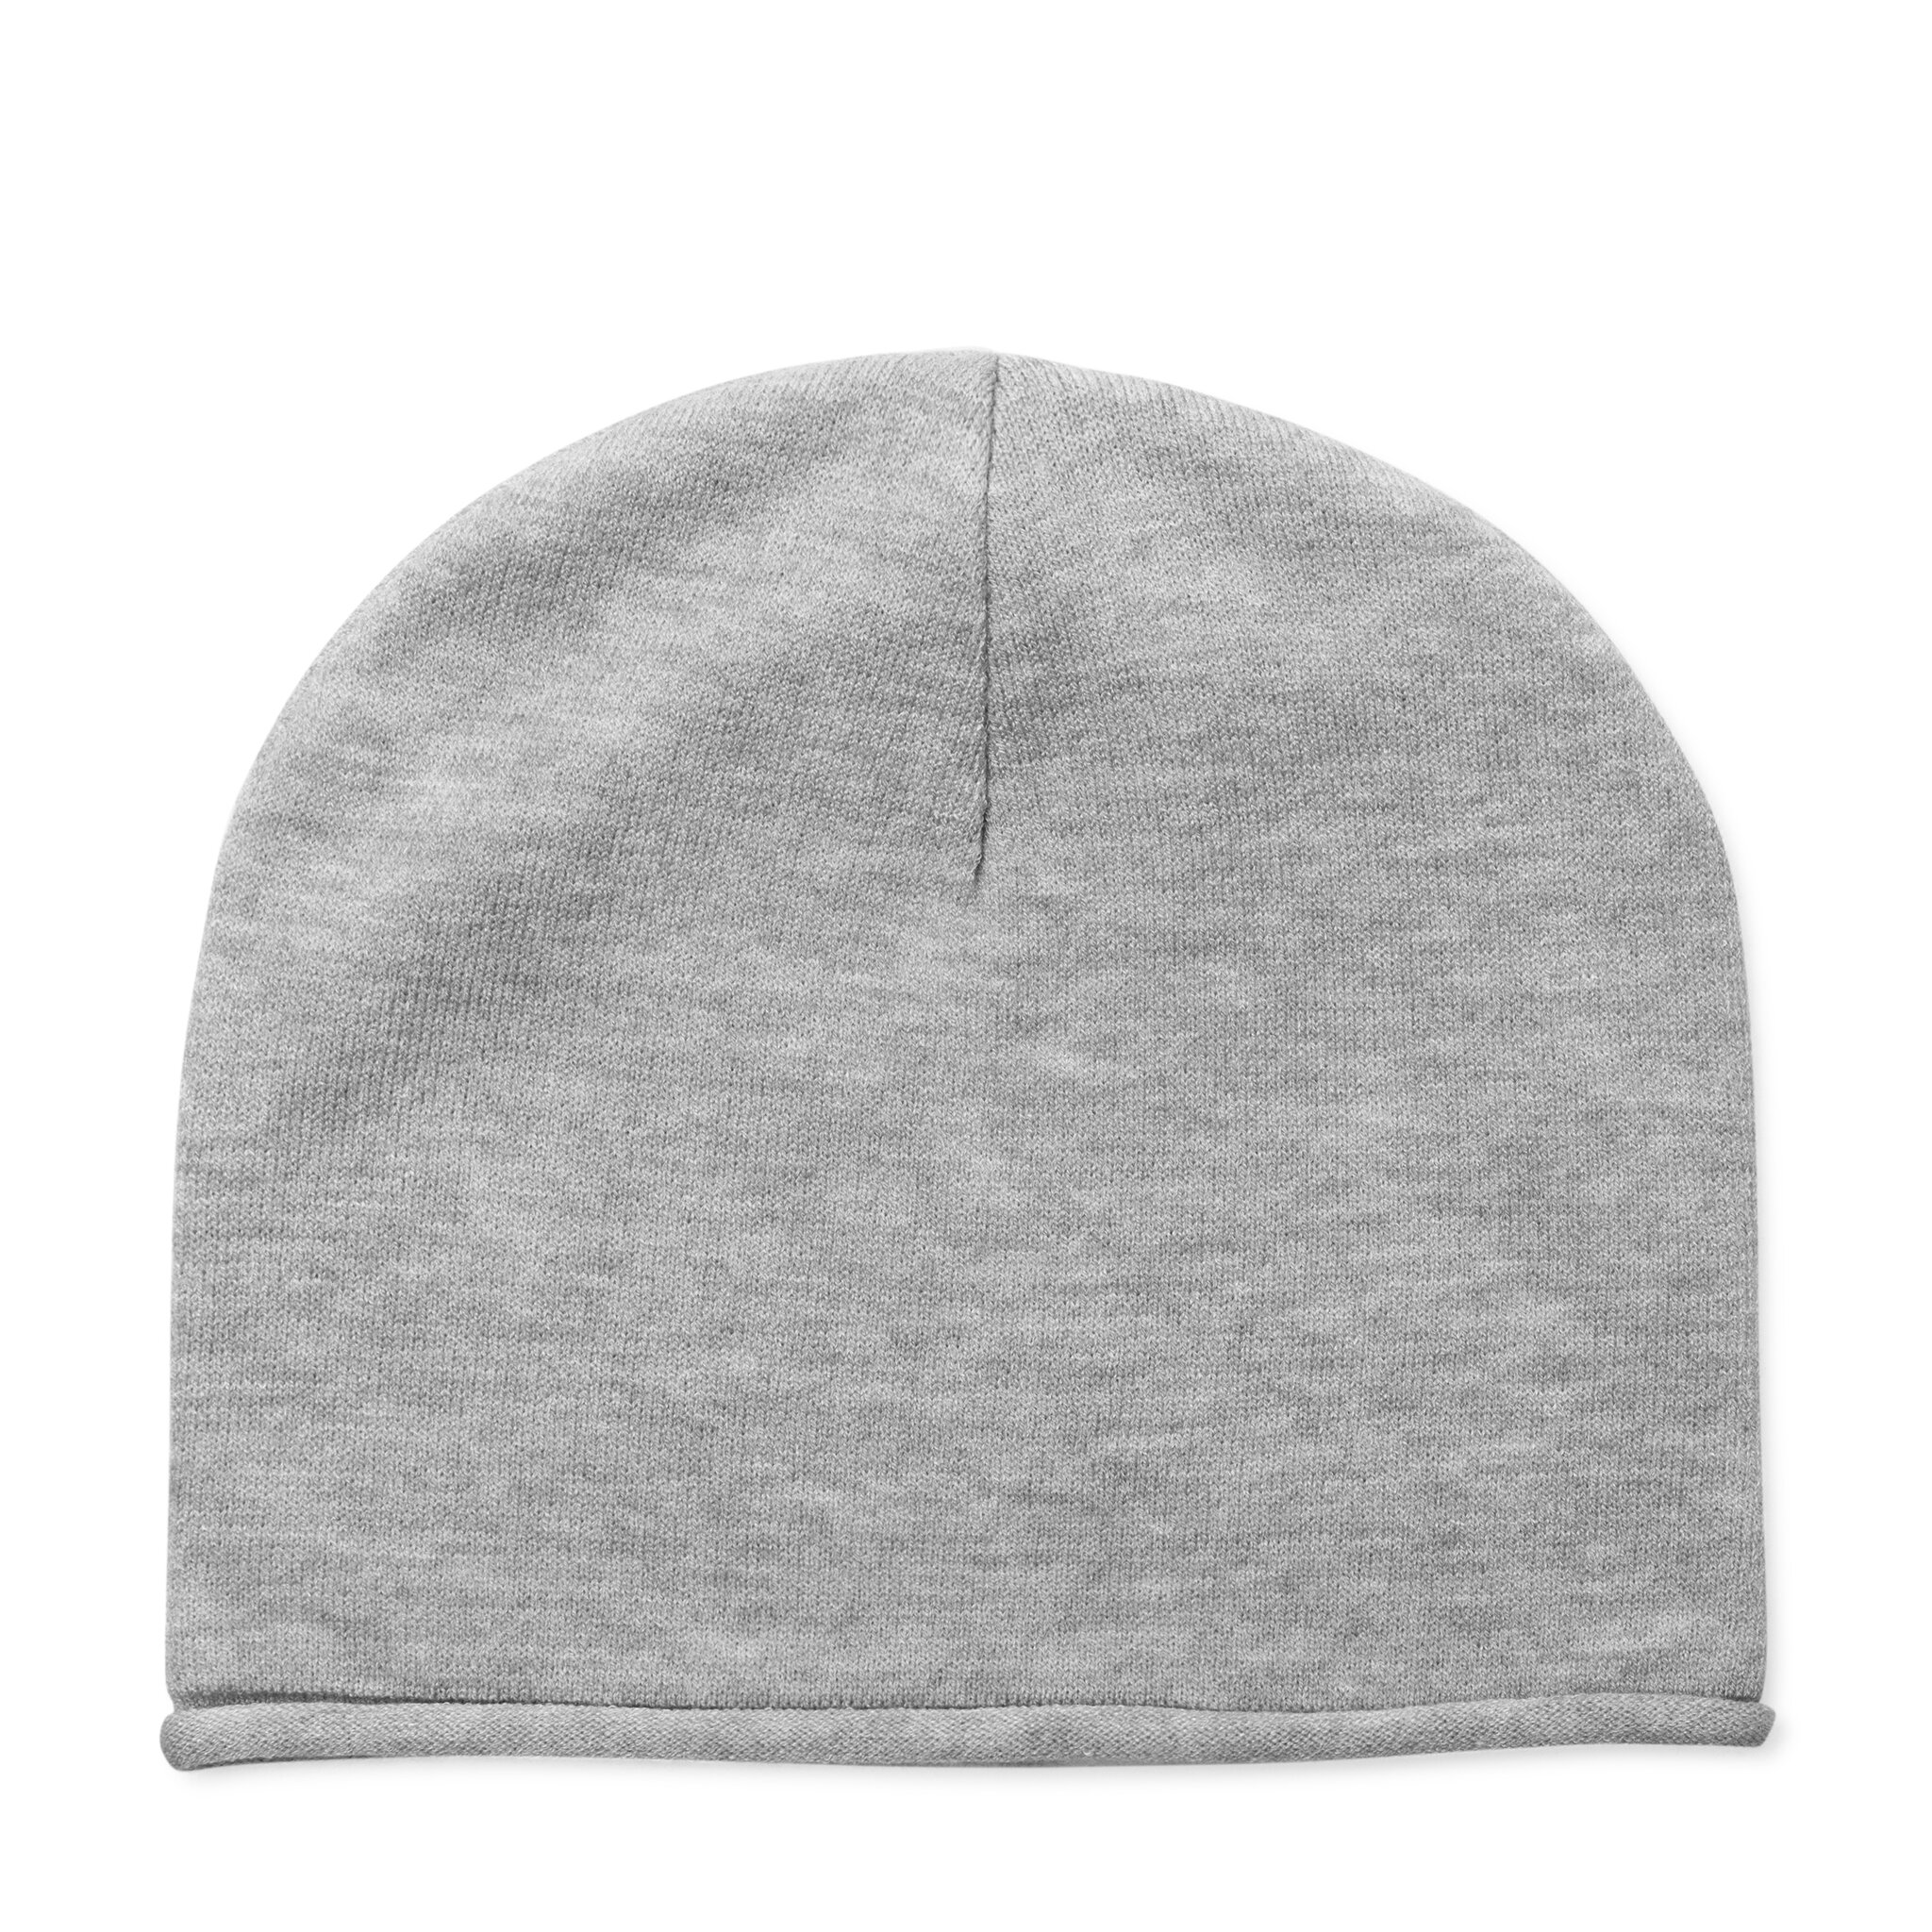 Mössa - Mössor   hattar - Köp online på åhlens.se! cc8772ebce03b